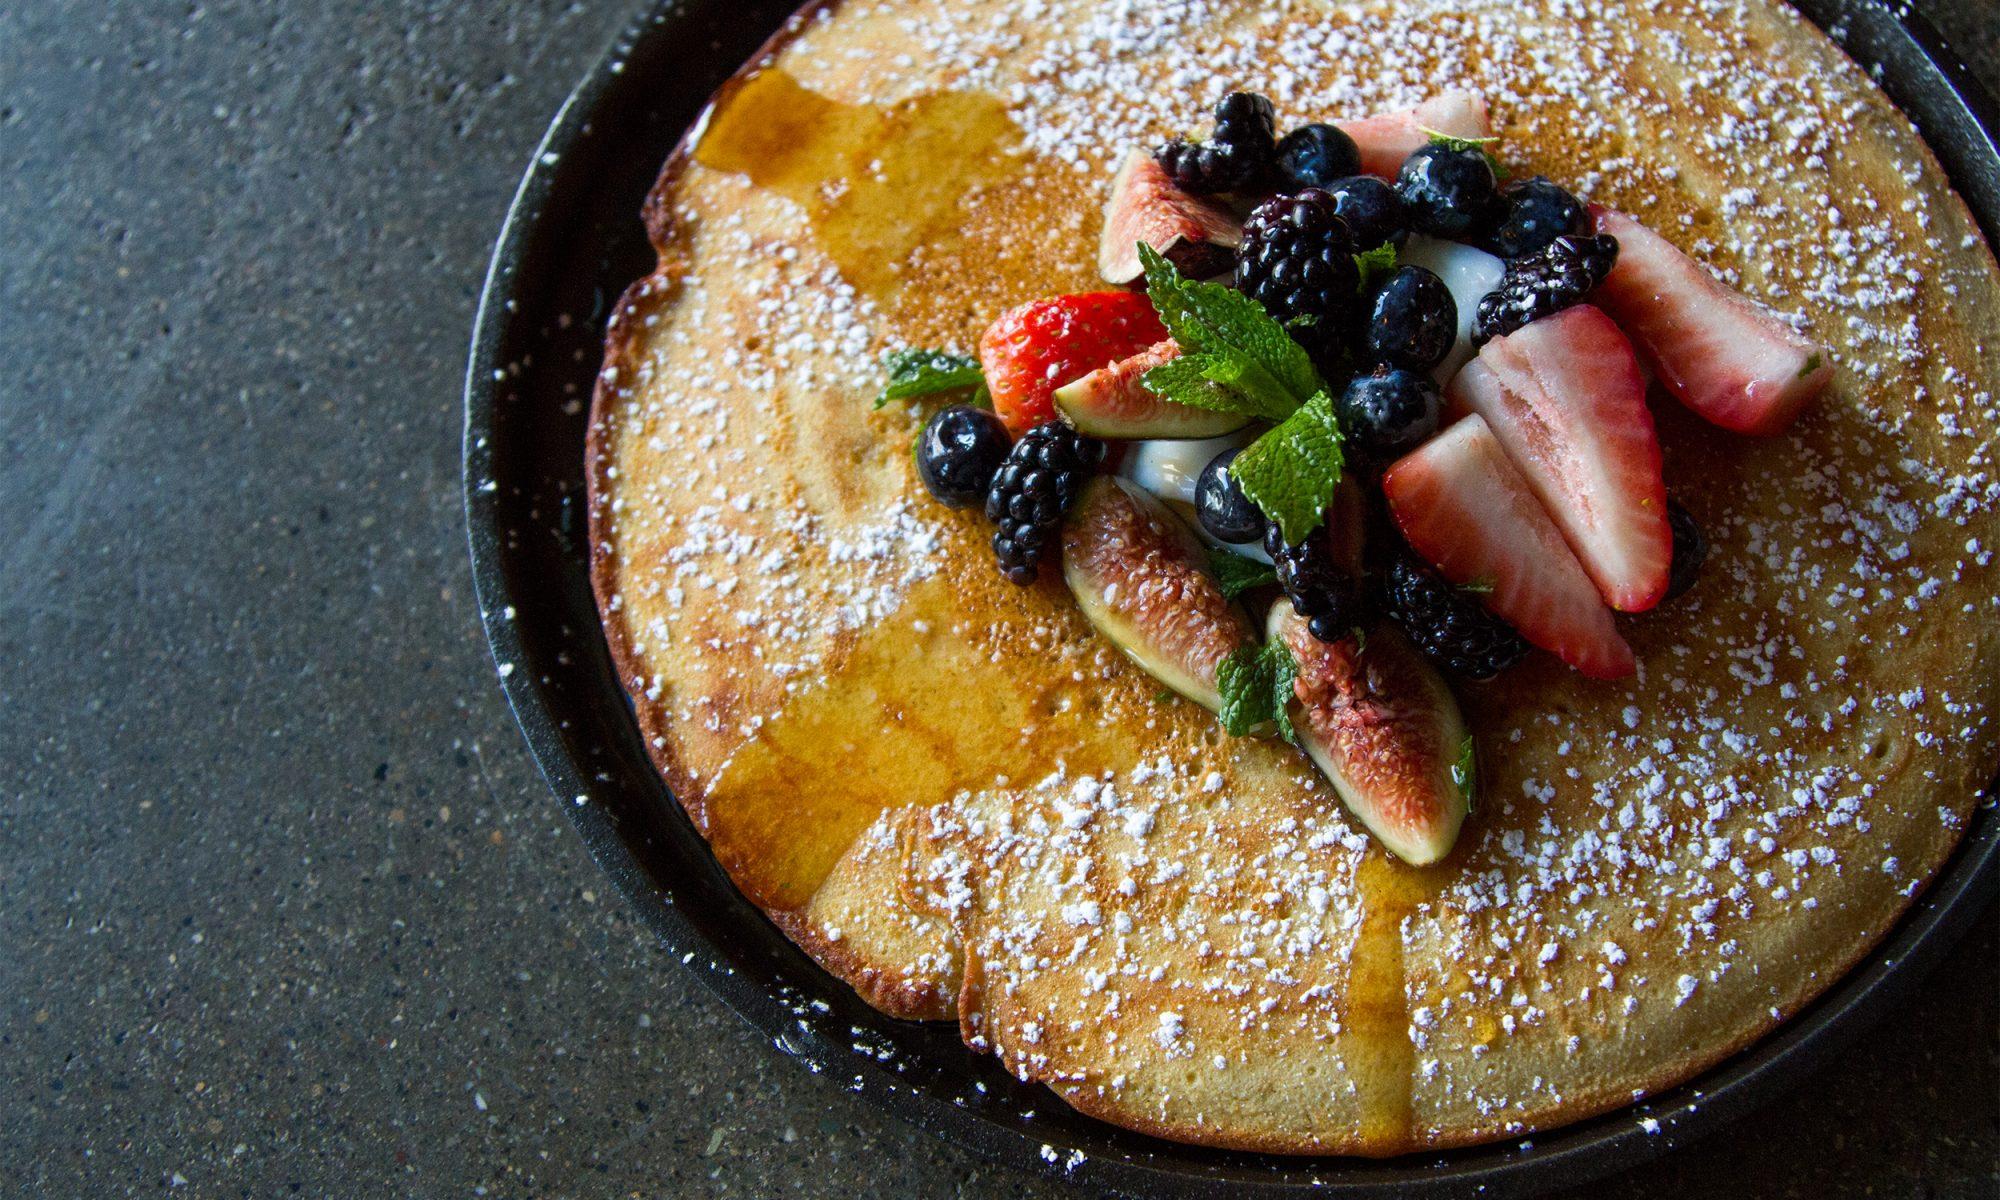 Italian-Style Semolina Pancakes That'll Make Your Nonna Proud